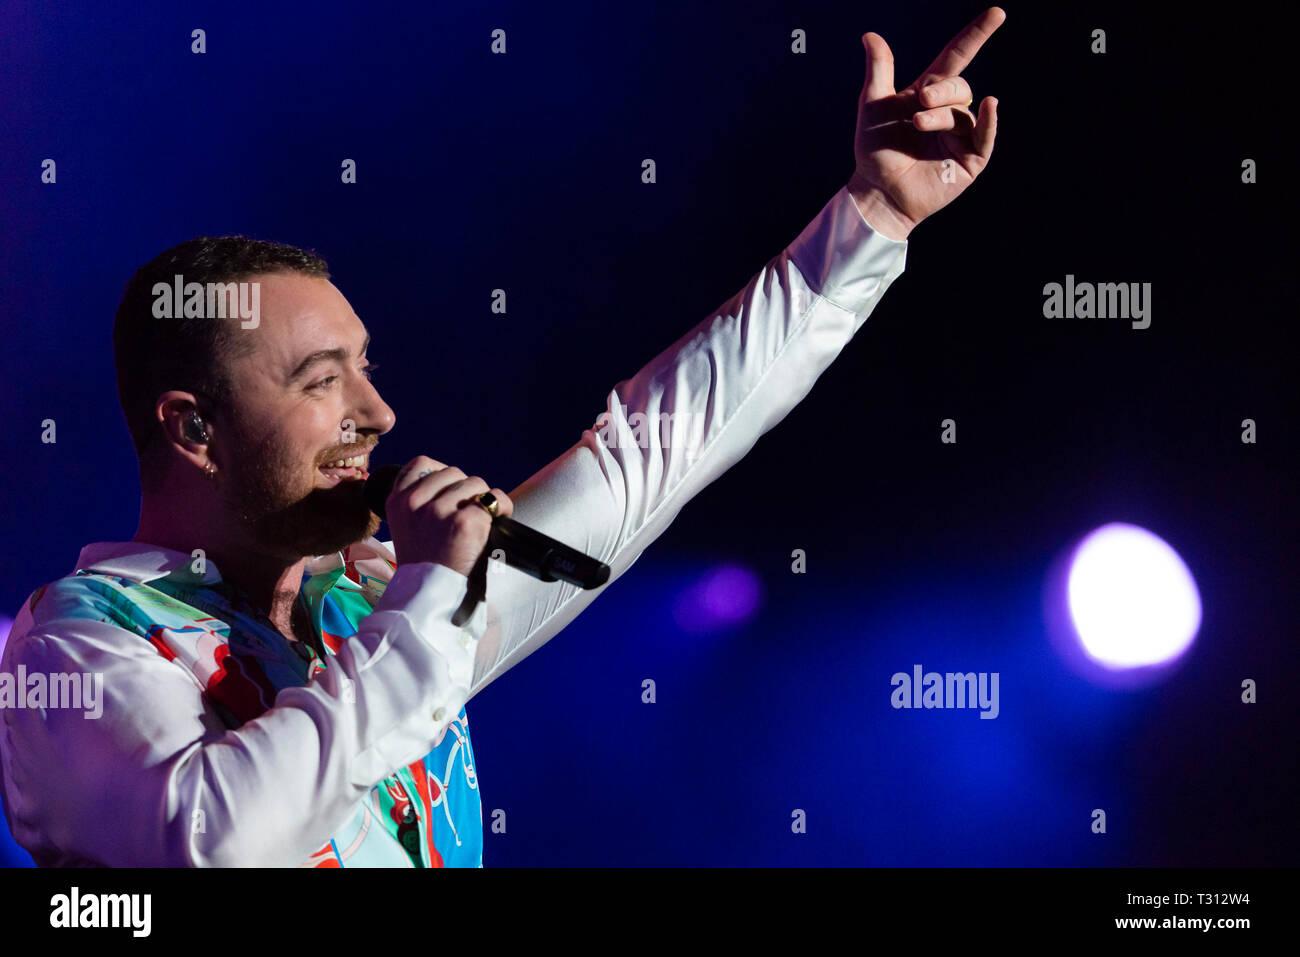 Sao Paulo, Brazil. 05th Apr, 2019.Sam Smith performs at the Lollapalooza 2019 festival, held at the Autodromo de Interlagos in São Paulo, on the night of Friday, 05. (PHOTO: ANDERSON LIRA/BRAZIL PHOTO PRESS) Credit: Brazil Photo Press/Alamy Live News - Stock Image